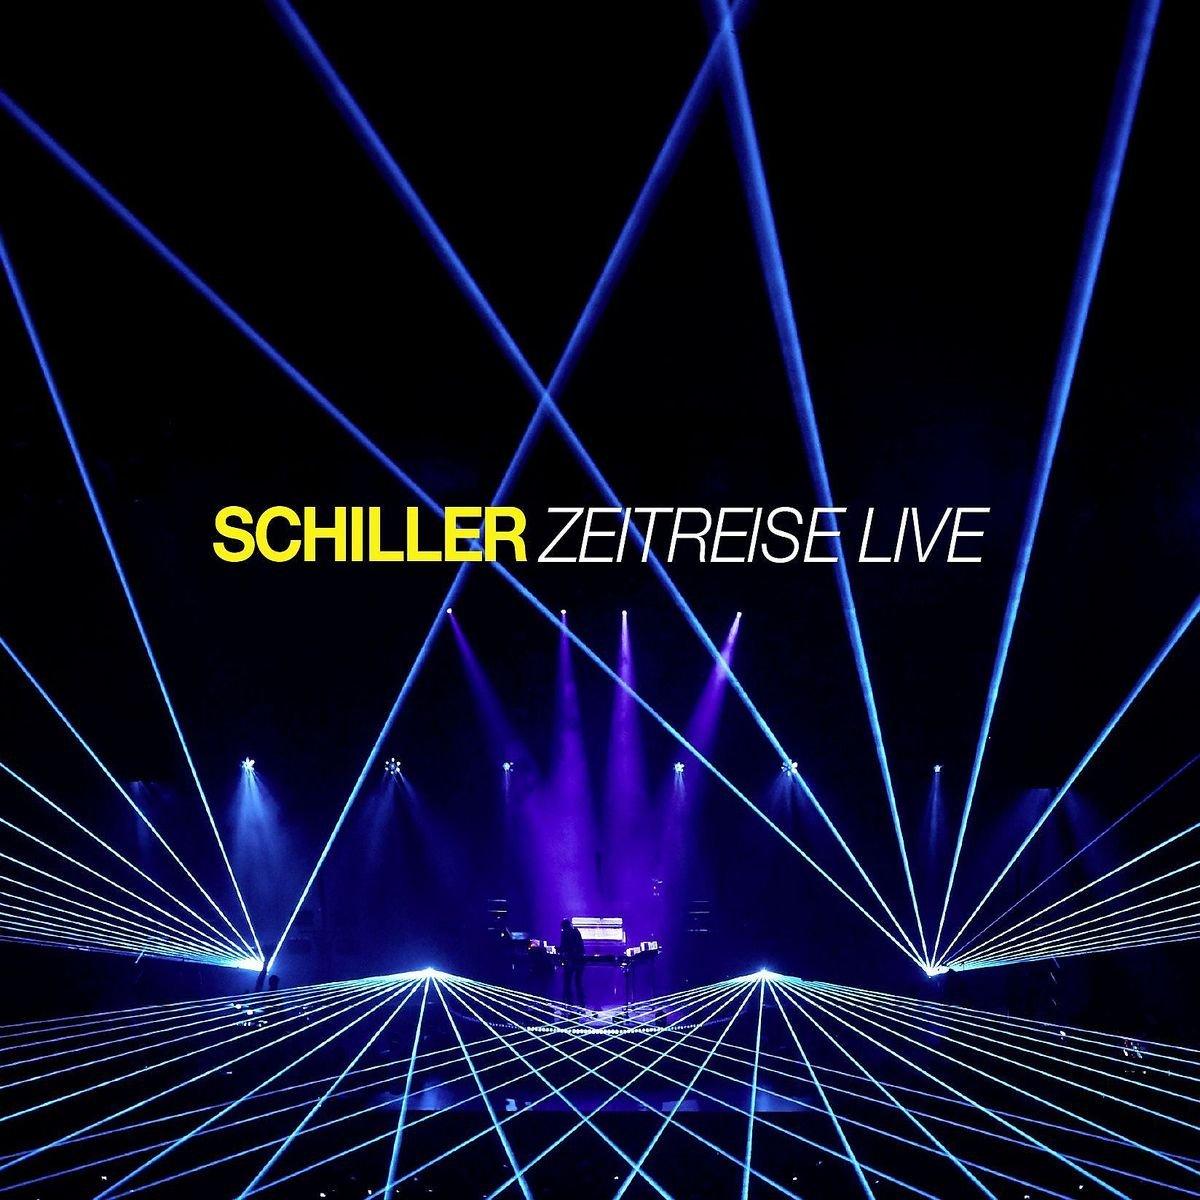 Schiller-Zeitreise Live-Limited Deluxe Edition-2CD-FLAC-2016-VOLDiES Download